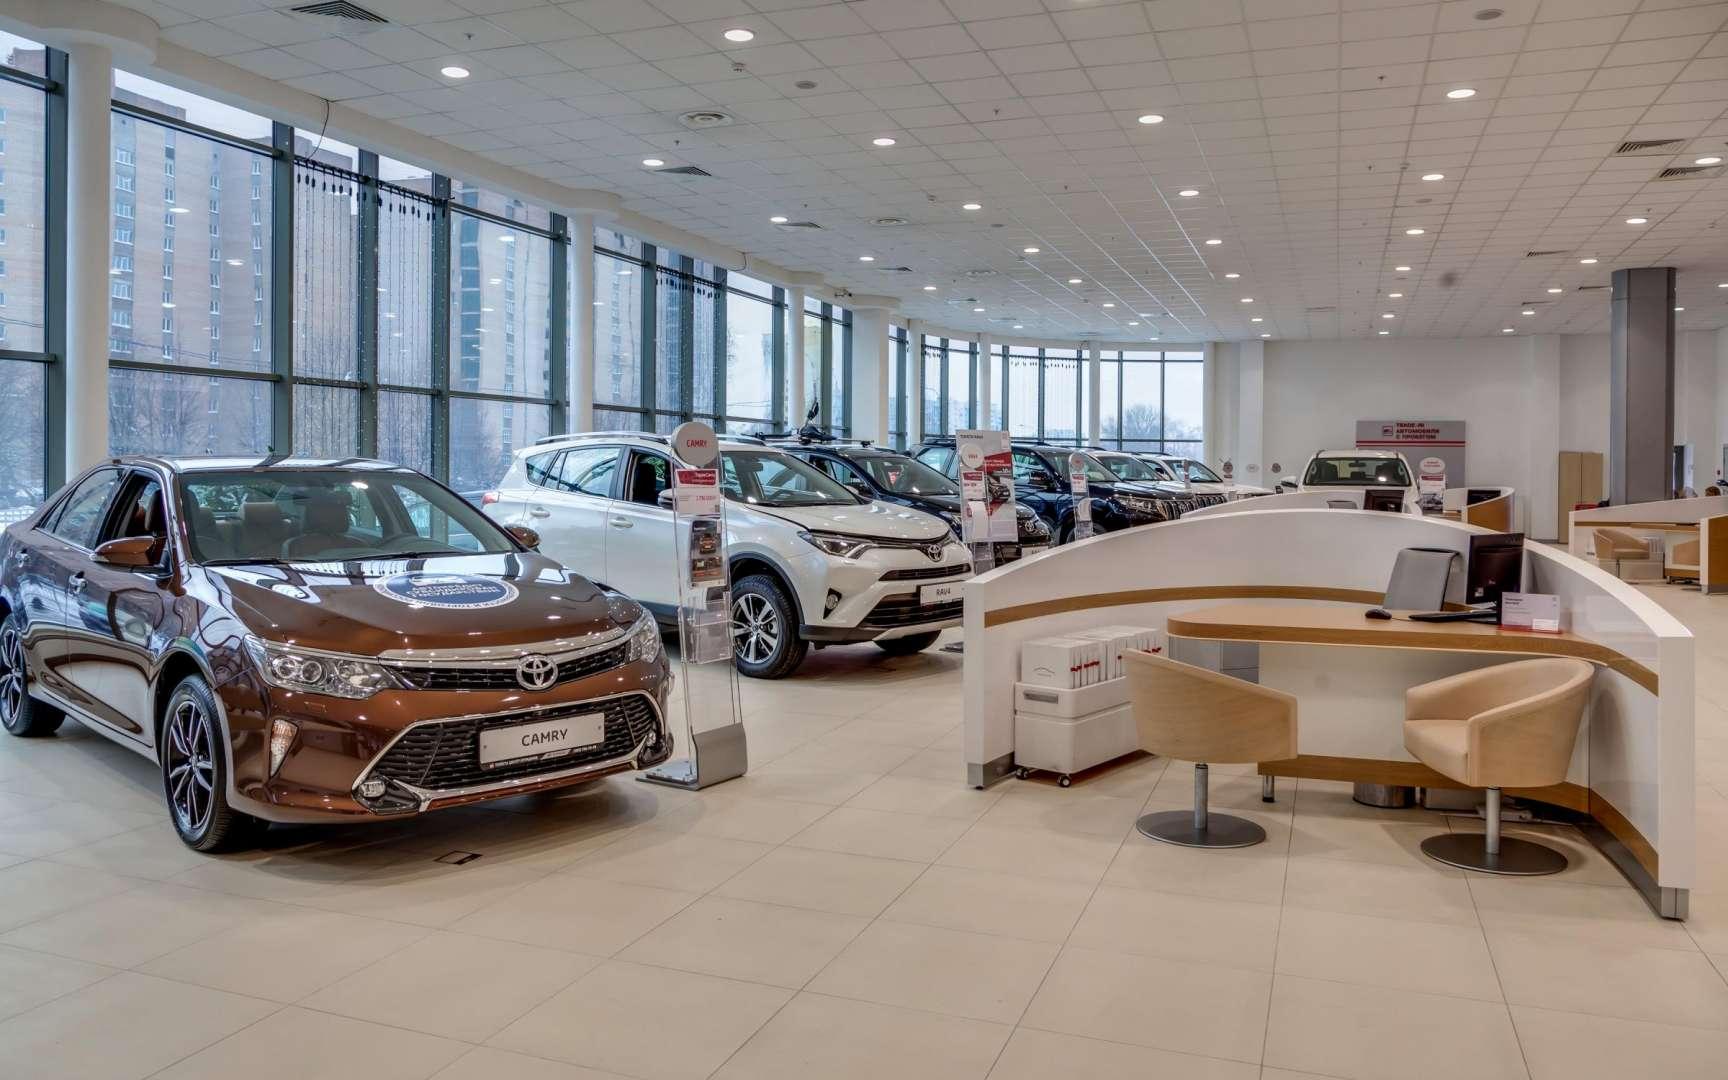 Компания Toyota увеличила ценники на свои модели второй раз за лето